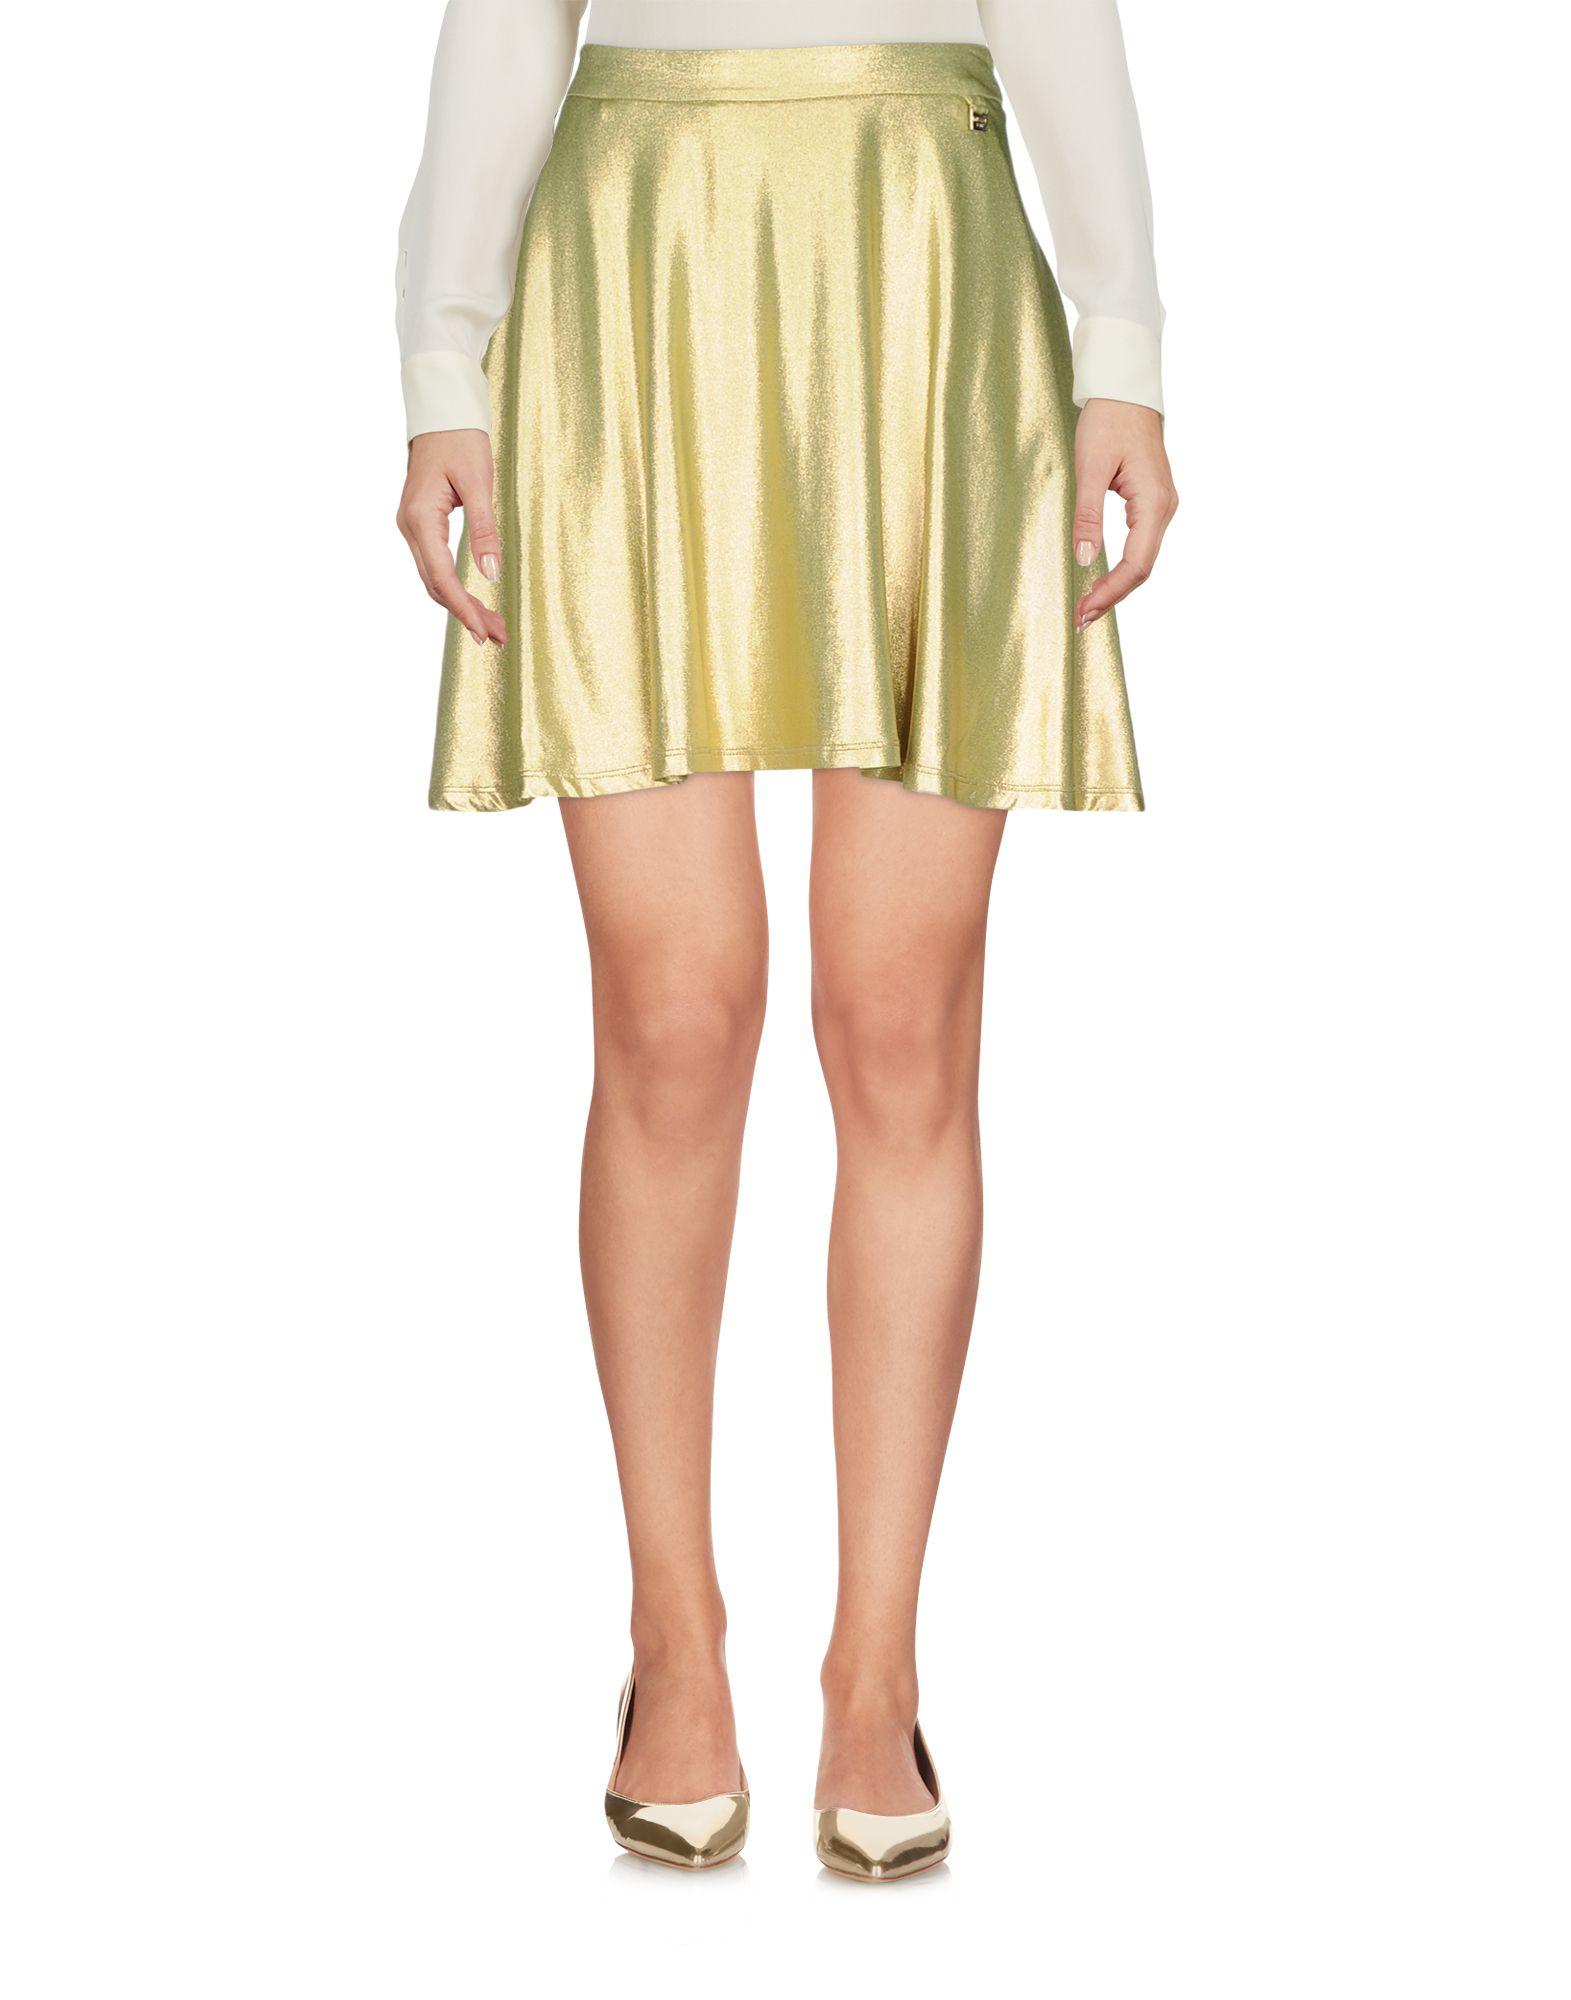 Minigonna Versace Jeans Donna - Acquista online su 5Cj2omNBS1